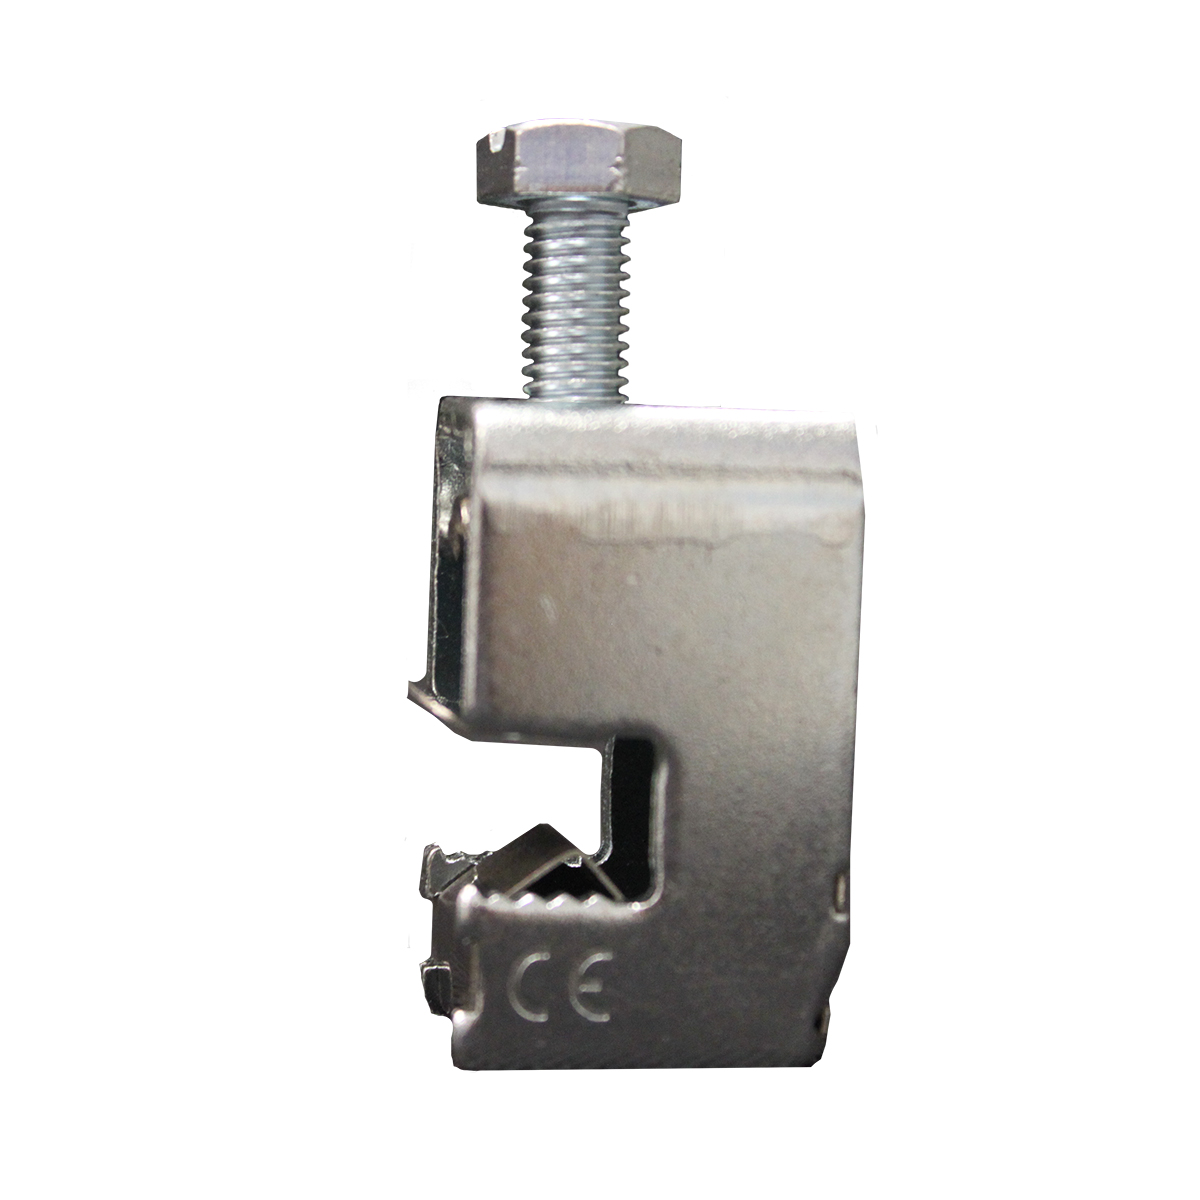 1 Stk Alu-Kupfer-Leiteranschlußklemme 16 -70mm² / 5mm IS5057005-